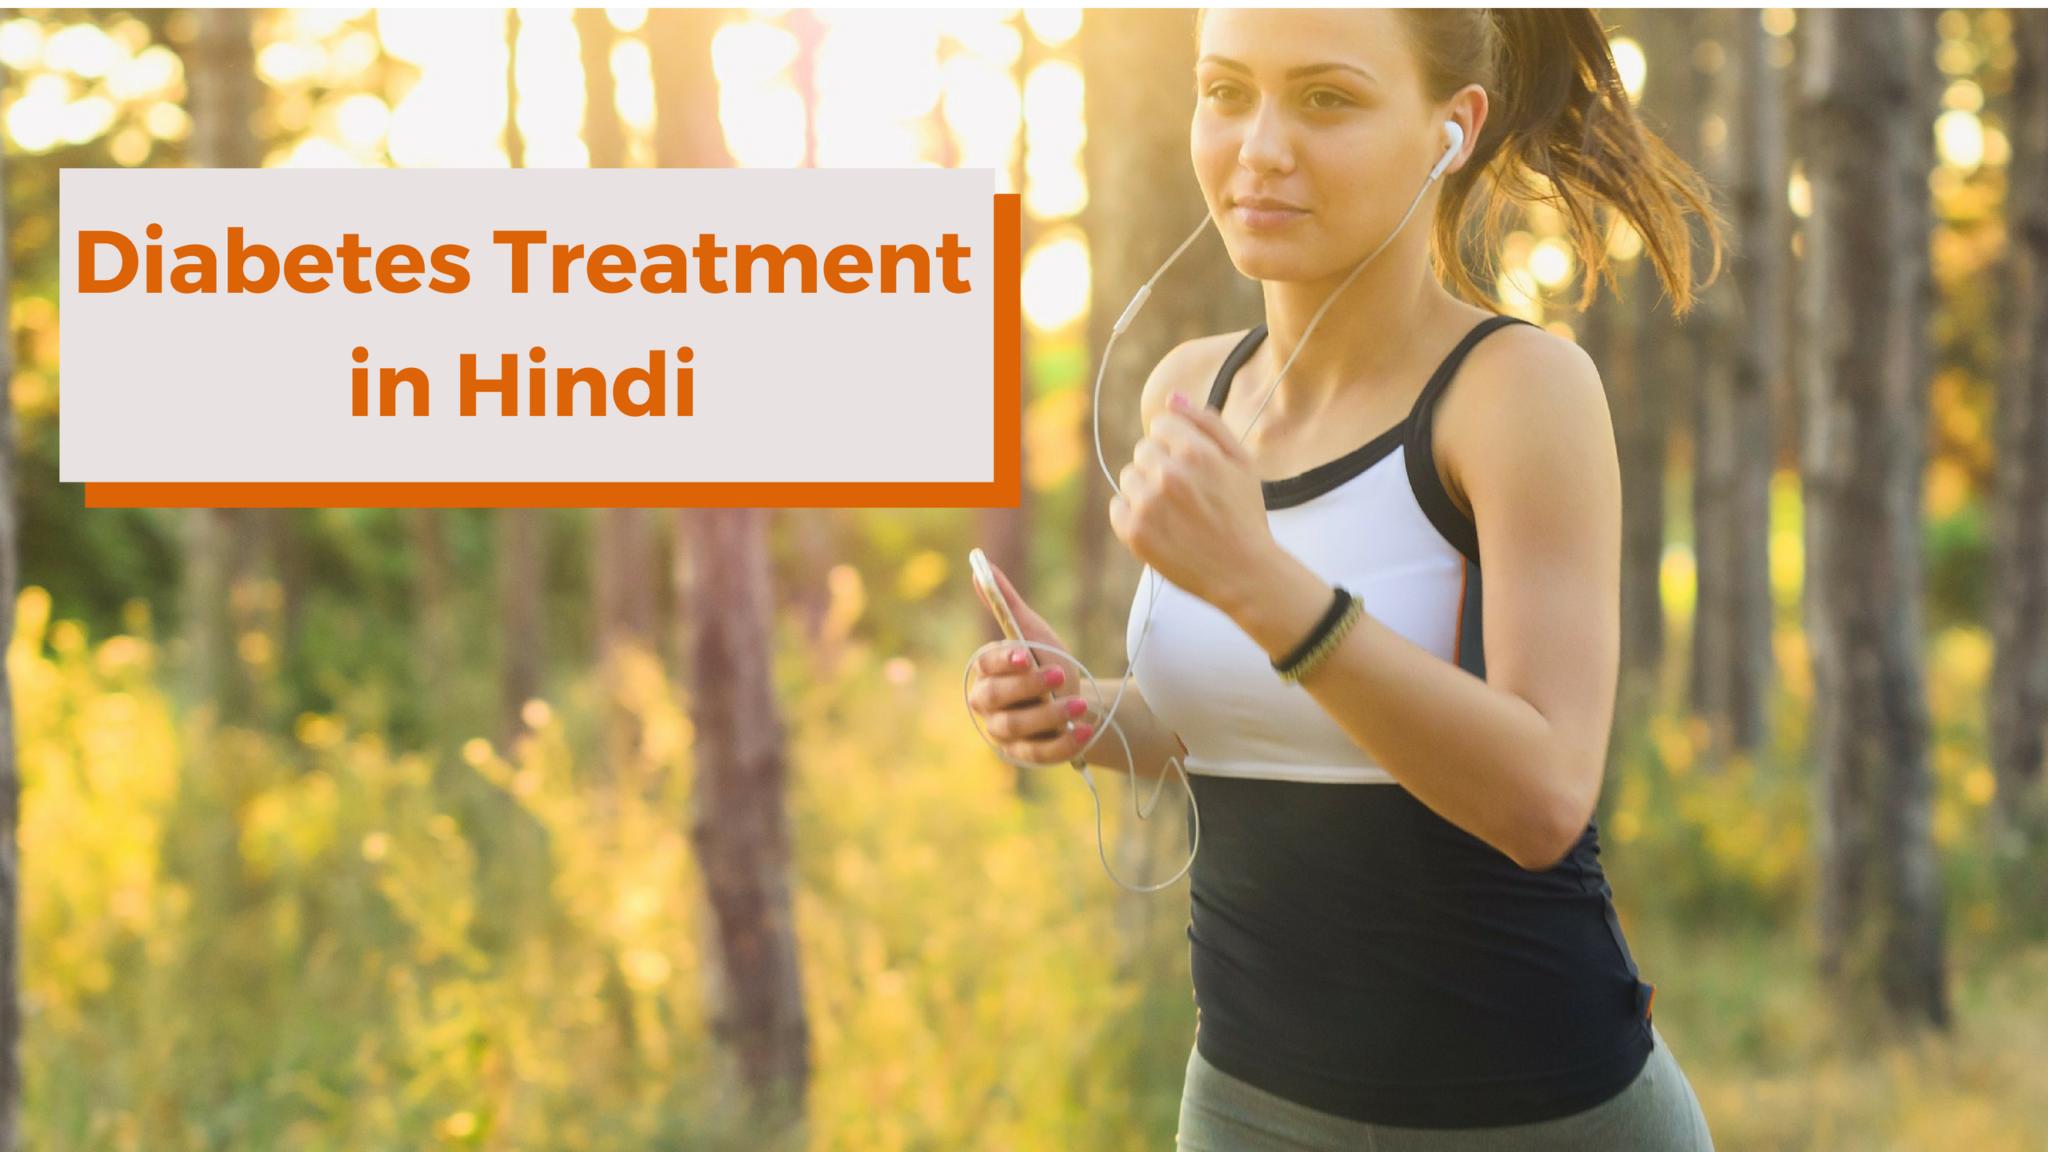 diabetes-treatment-in-hindi